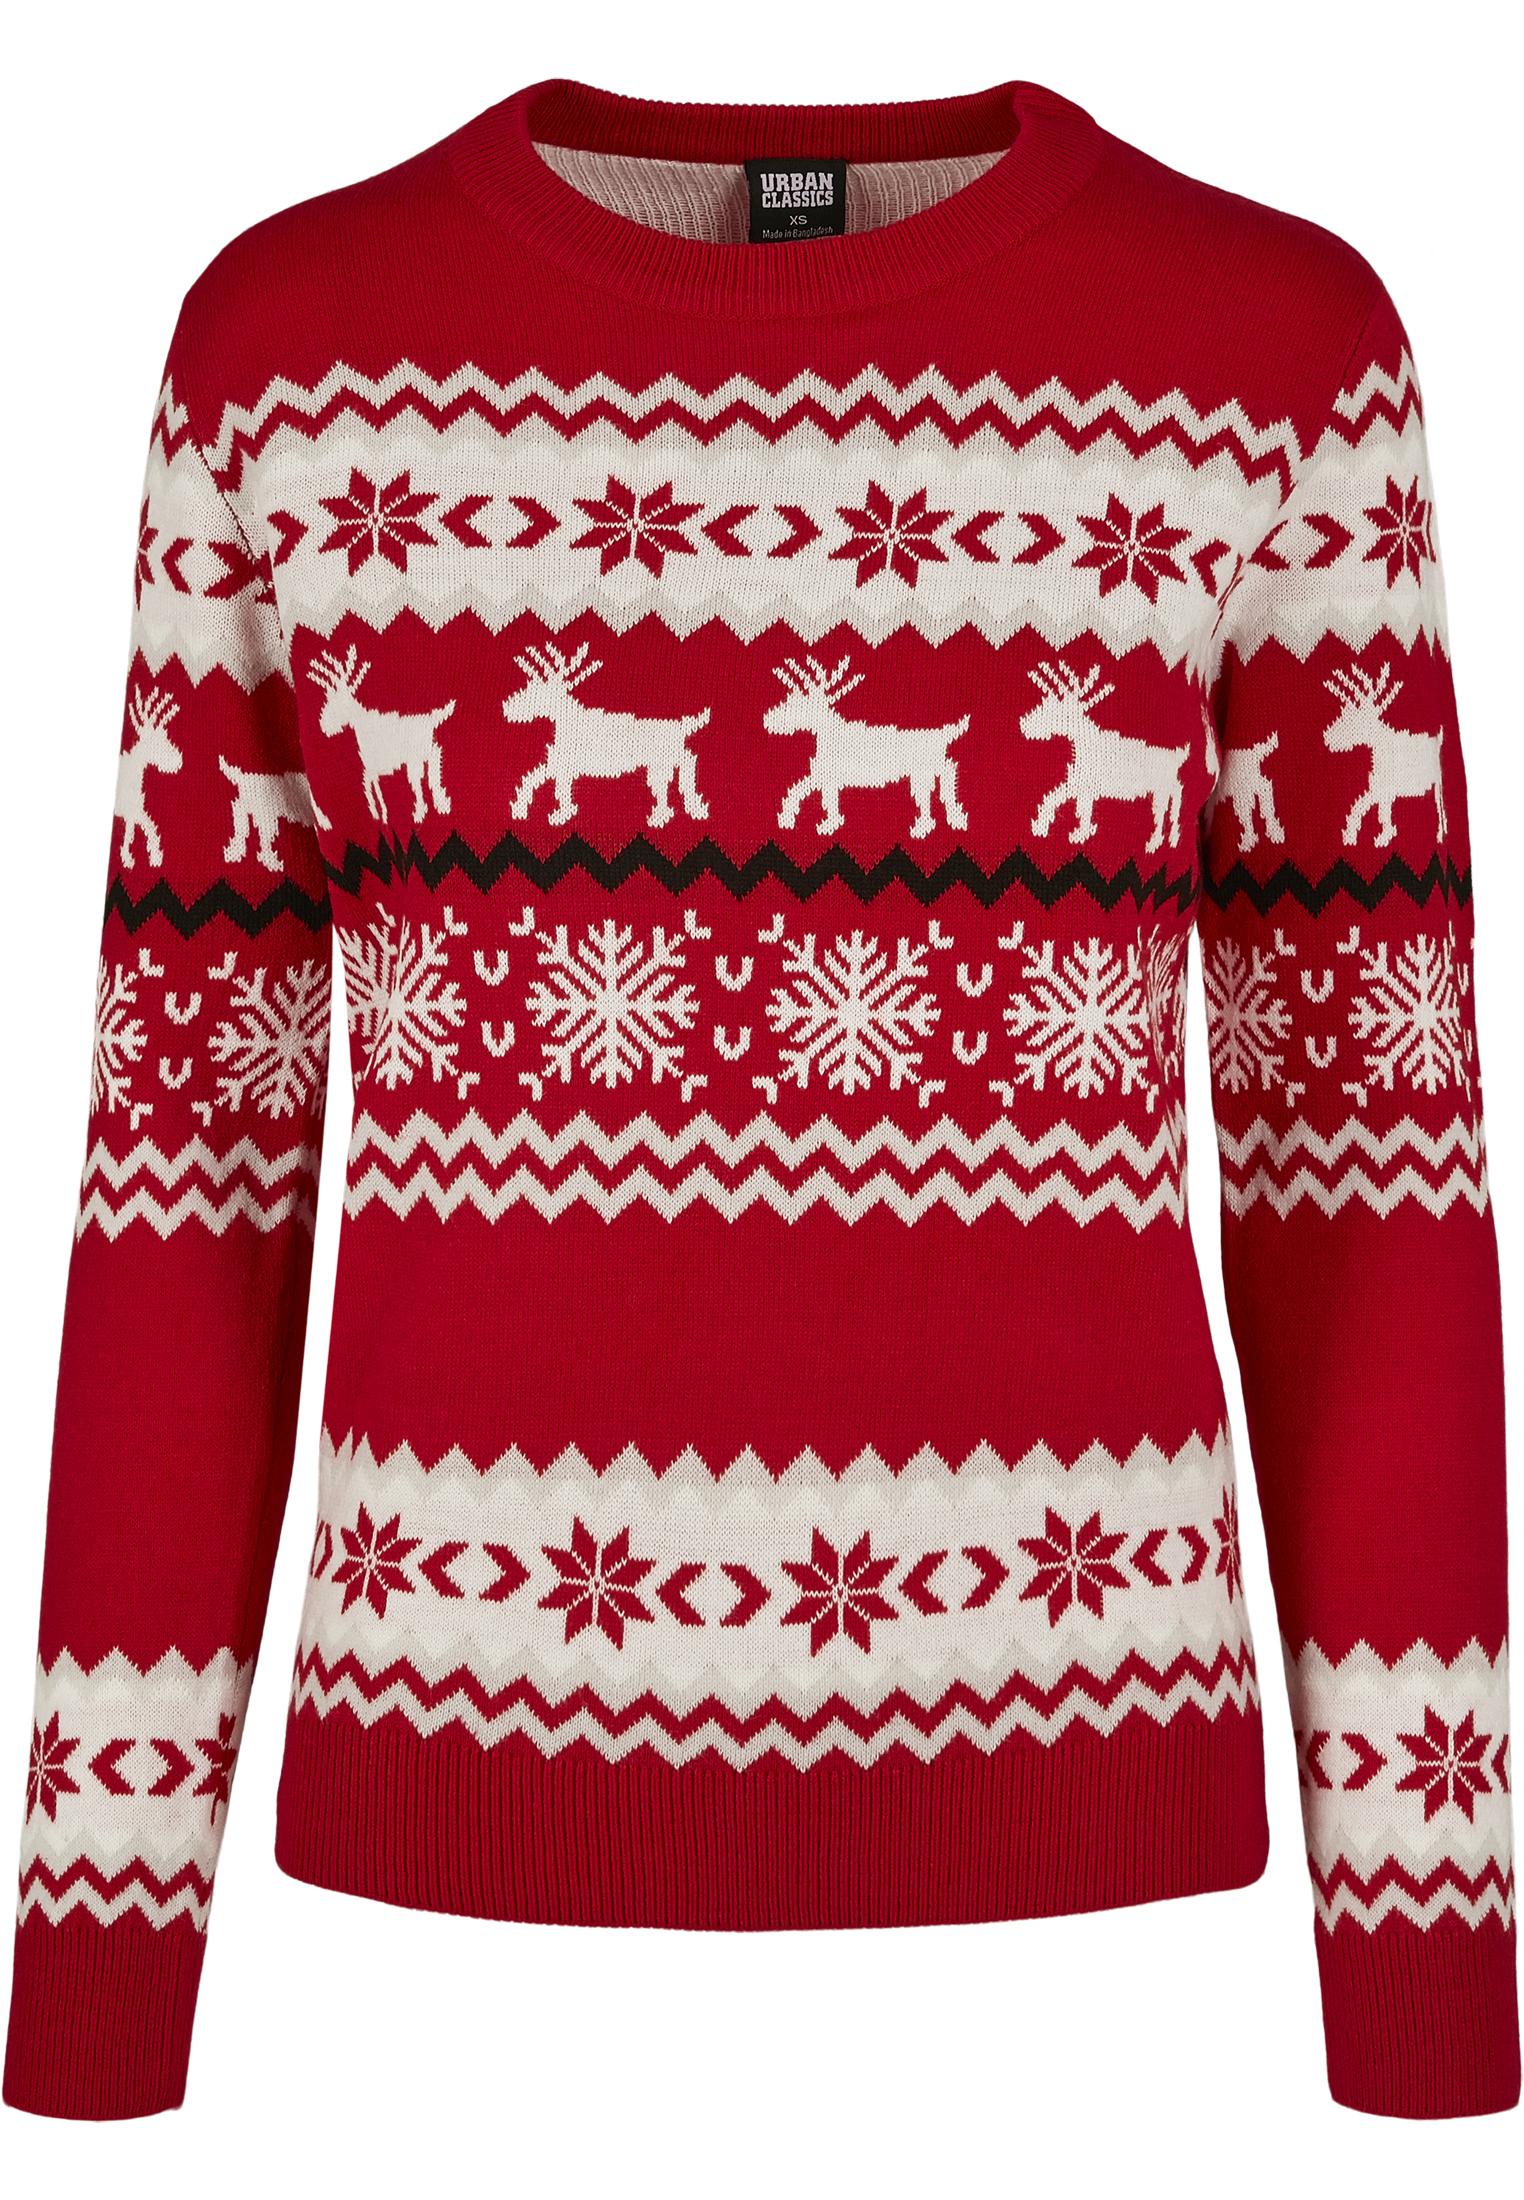 Ladies Norwegian Christmas Sweater TB3240